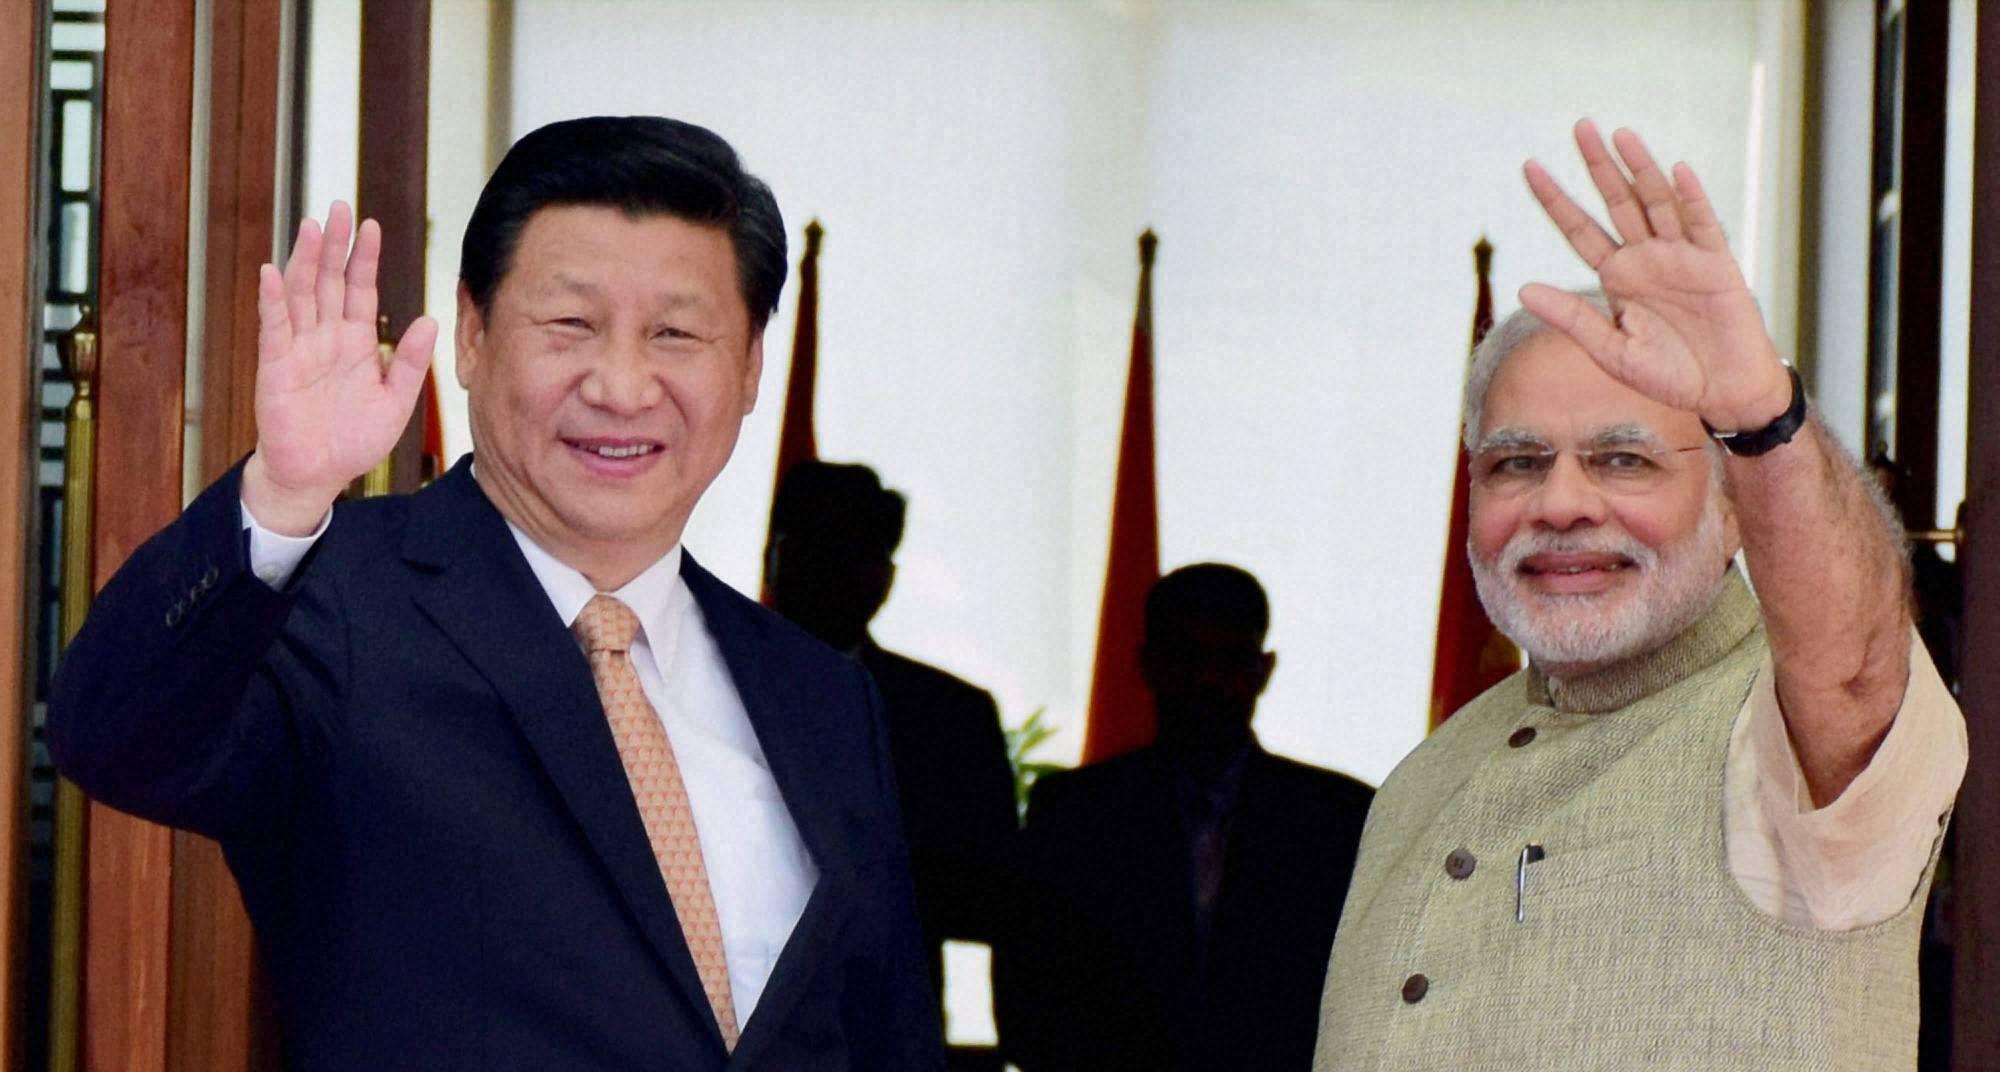 When Two Nationalist Leaders Meet